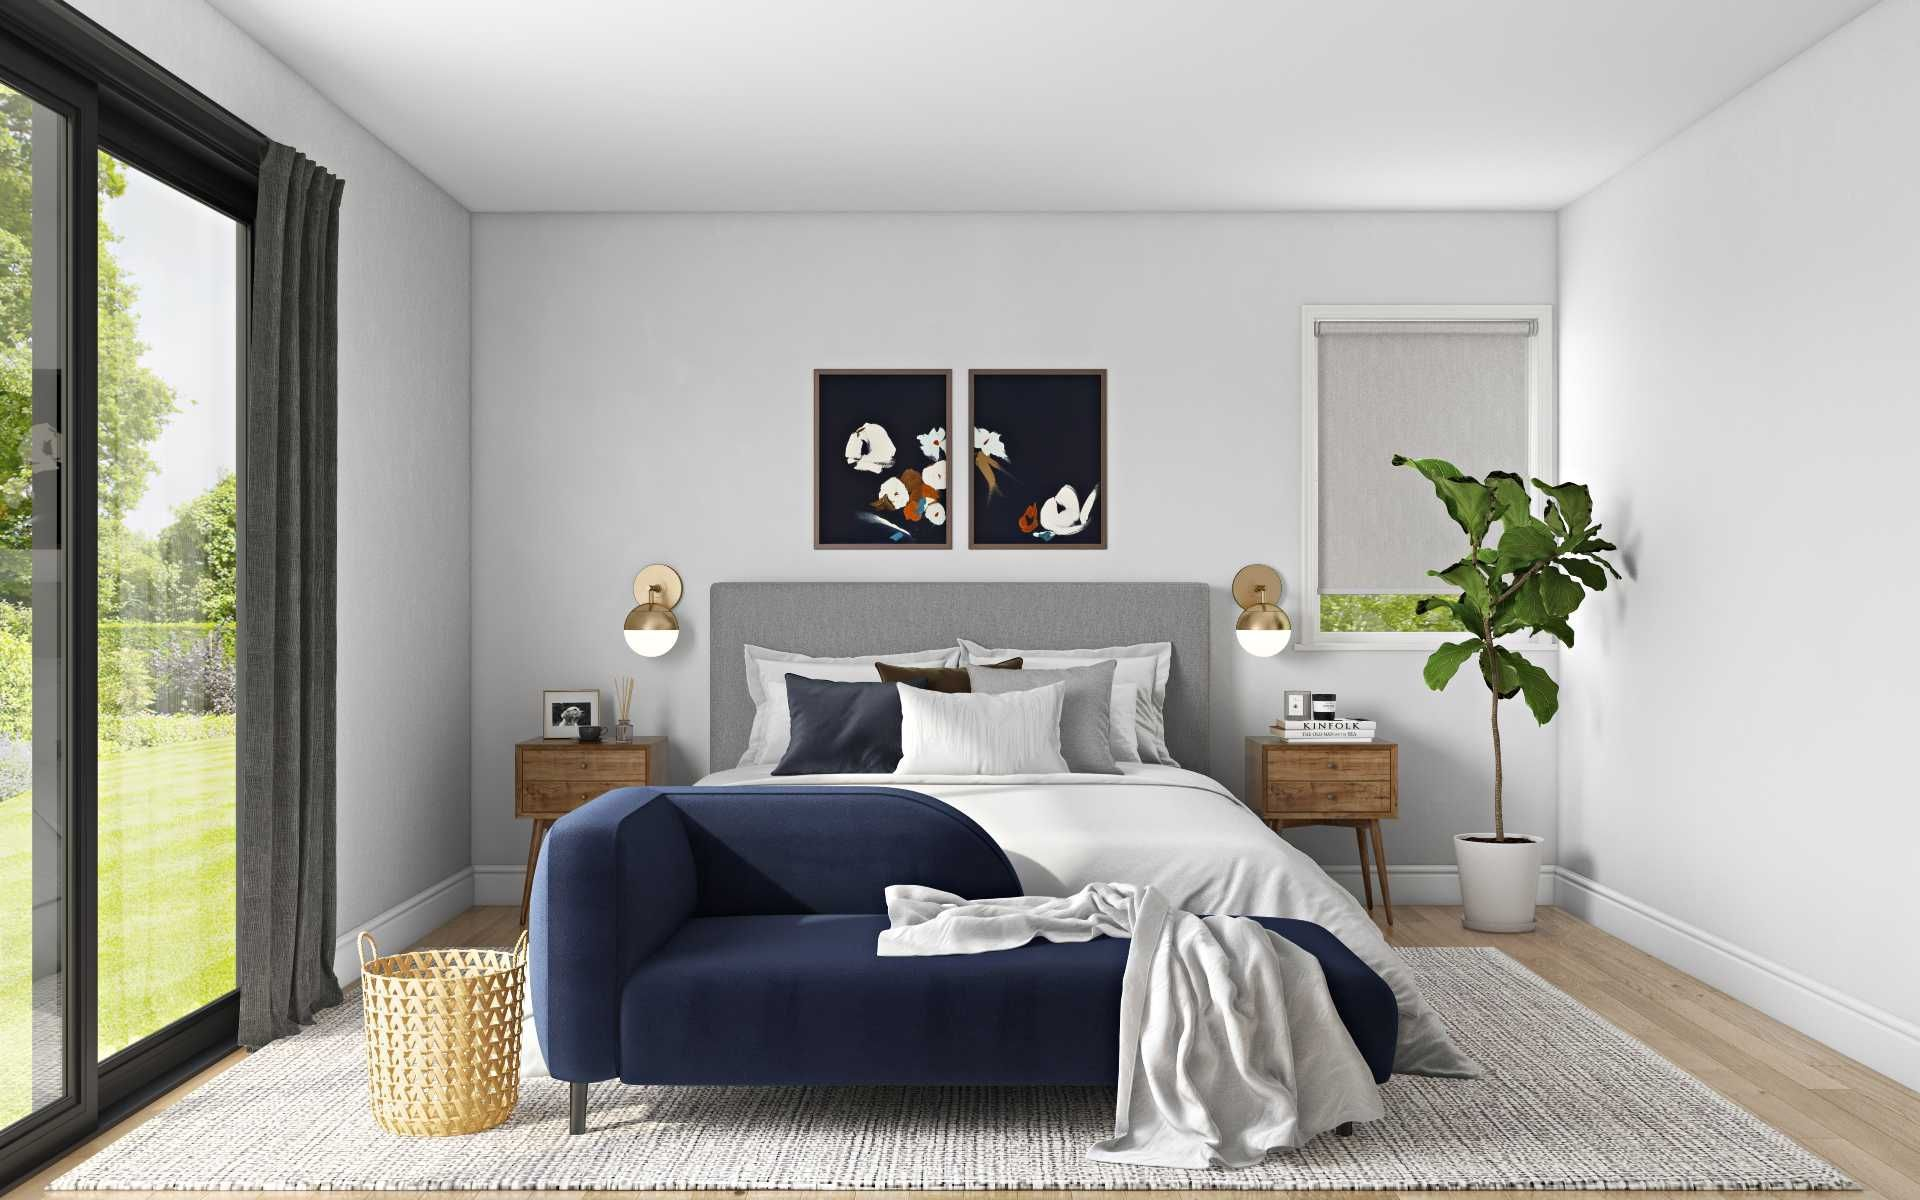 Midcentury Modern Minimal Scandinavian Bedroom Design By Havenly Interior Designer Maria Bedroom Design Scandinavian Design Bedroom Online Interior Design